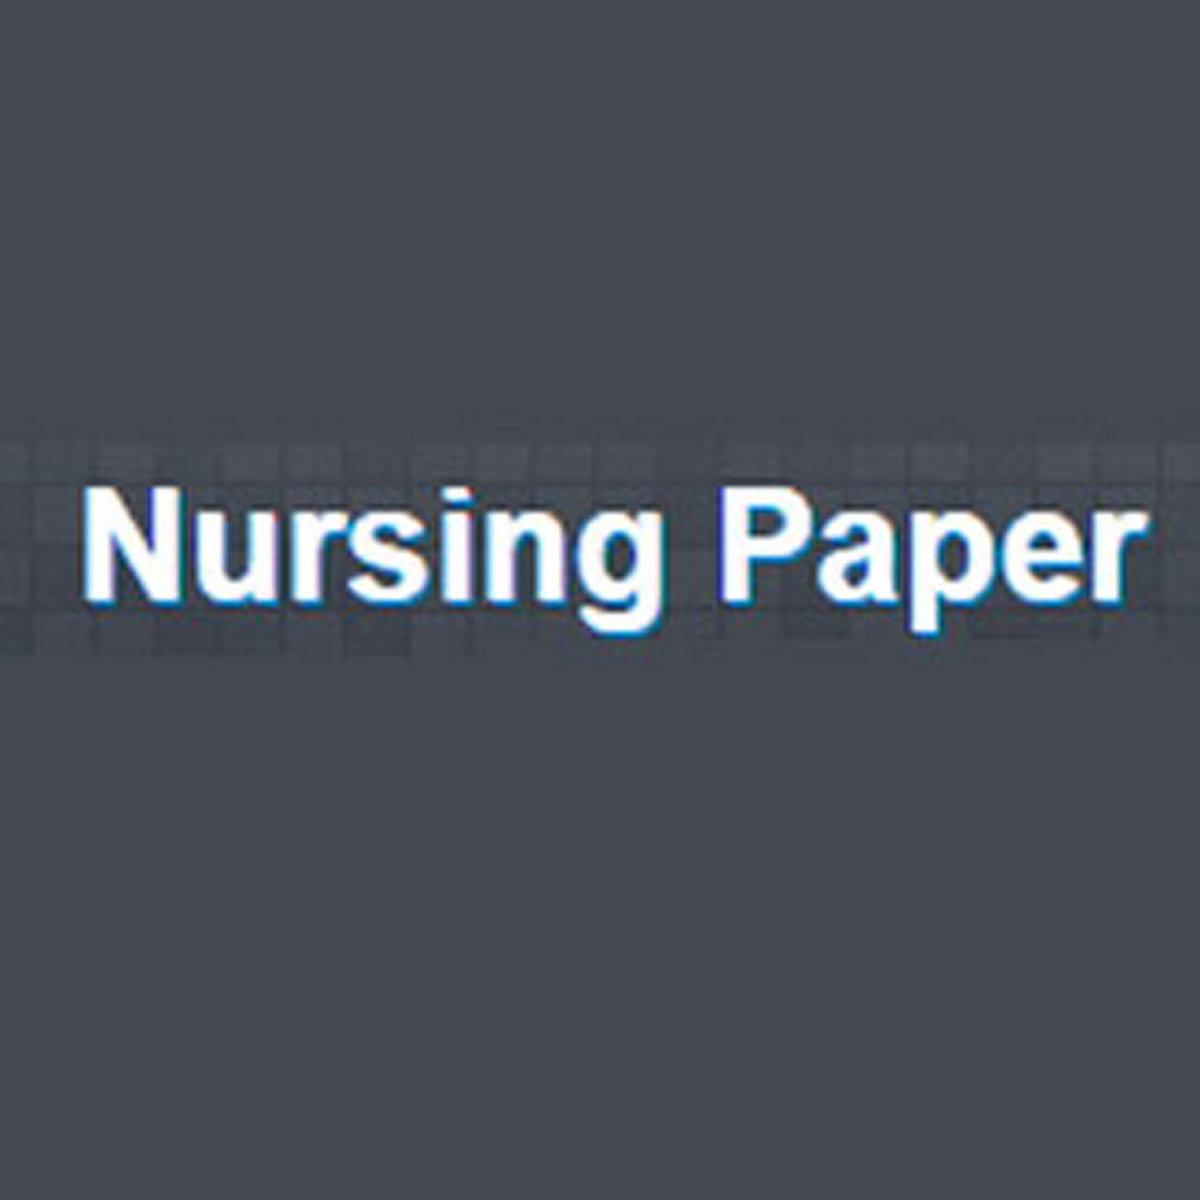 nursing portfolio template uk nursing paper